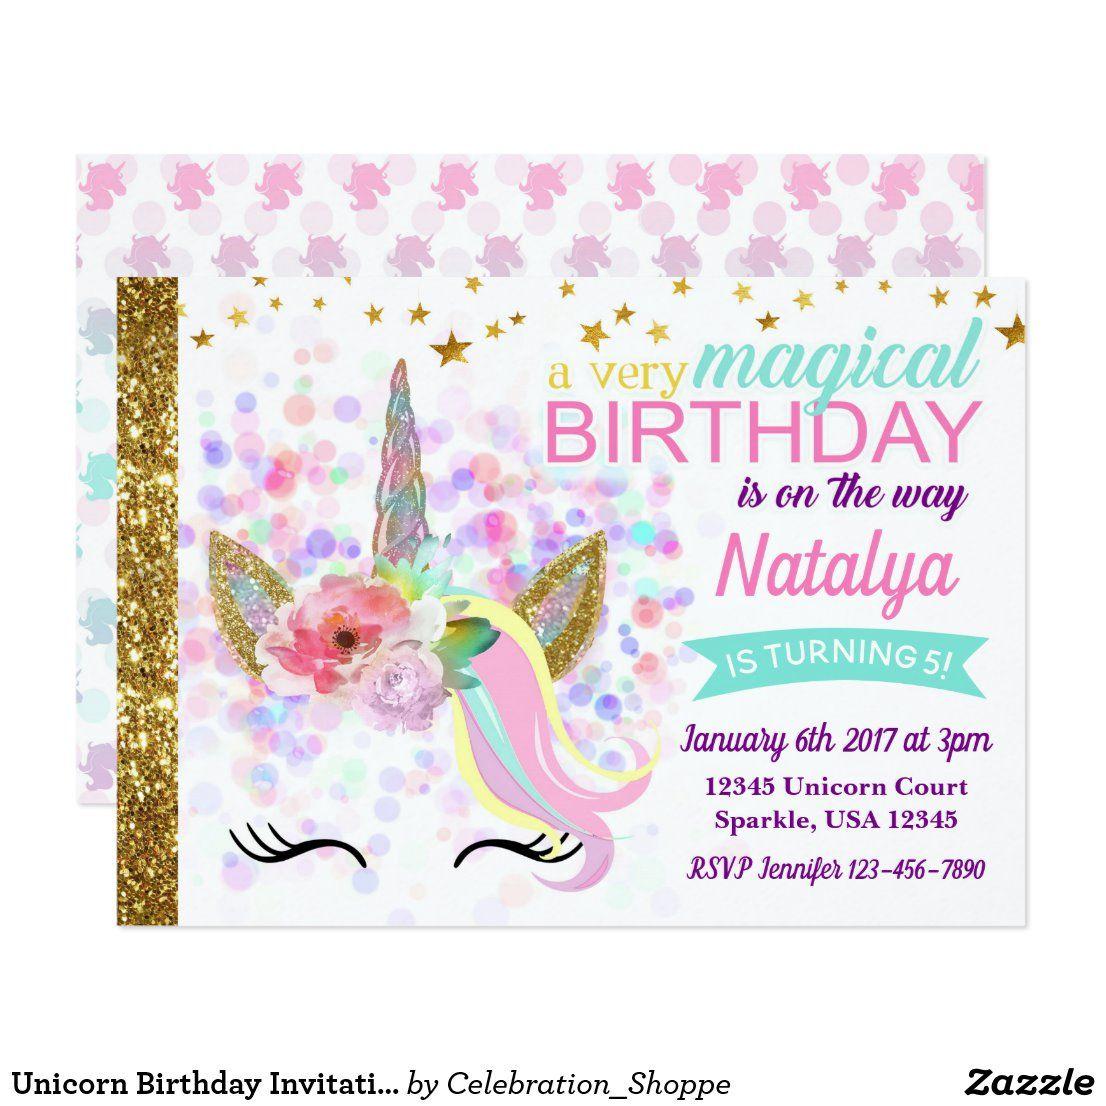 Unicorn Birthday Invitation Magical in 2020